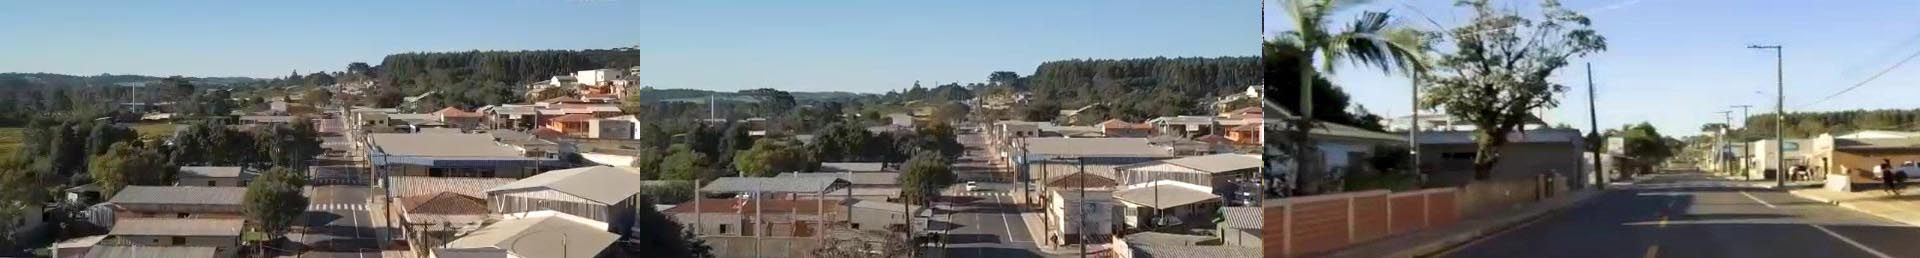 Rua Teixeira Duarte